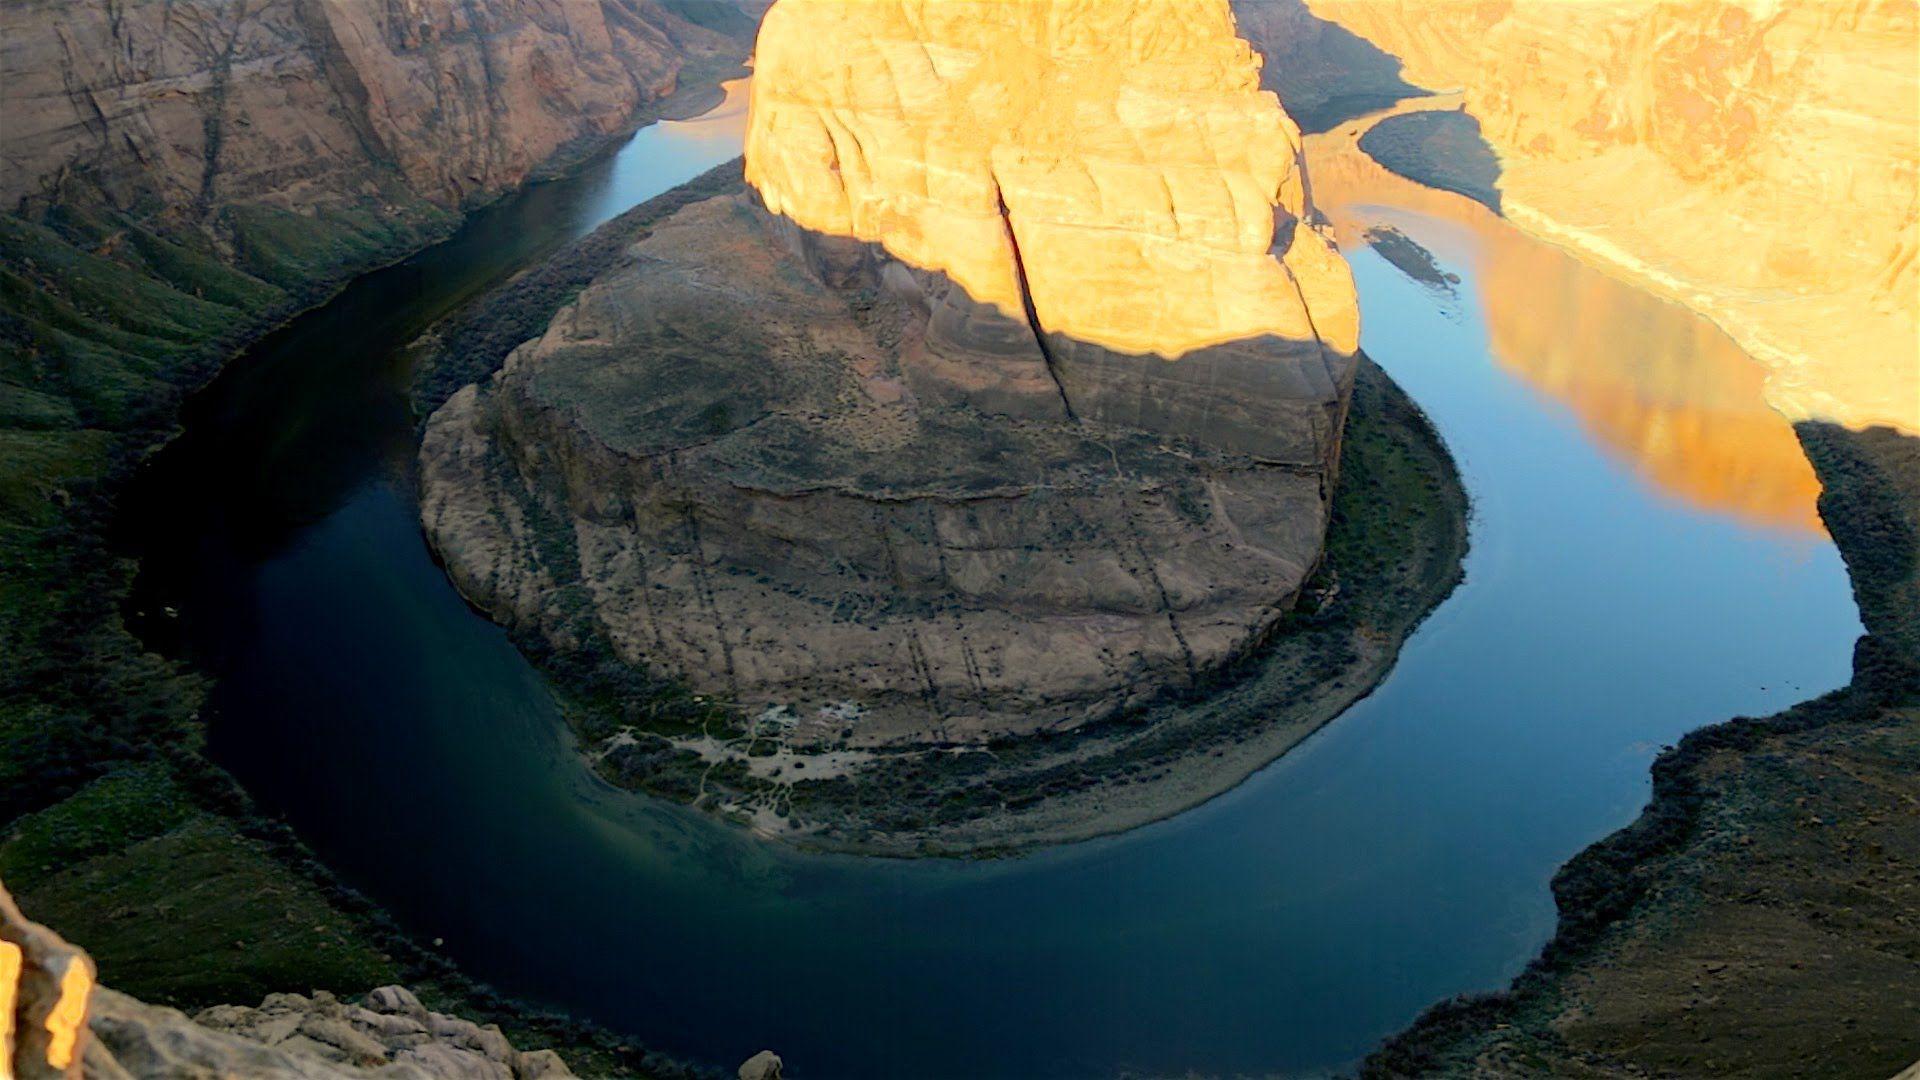 [VIDEO] Horseshoe Bend Arizona USA. 2016 [OC] #outdoors #nature #sky #weather #hiking #camping #world #love https://www.youtube.com/watch?v=1ezVo5-mvSM